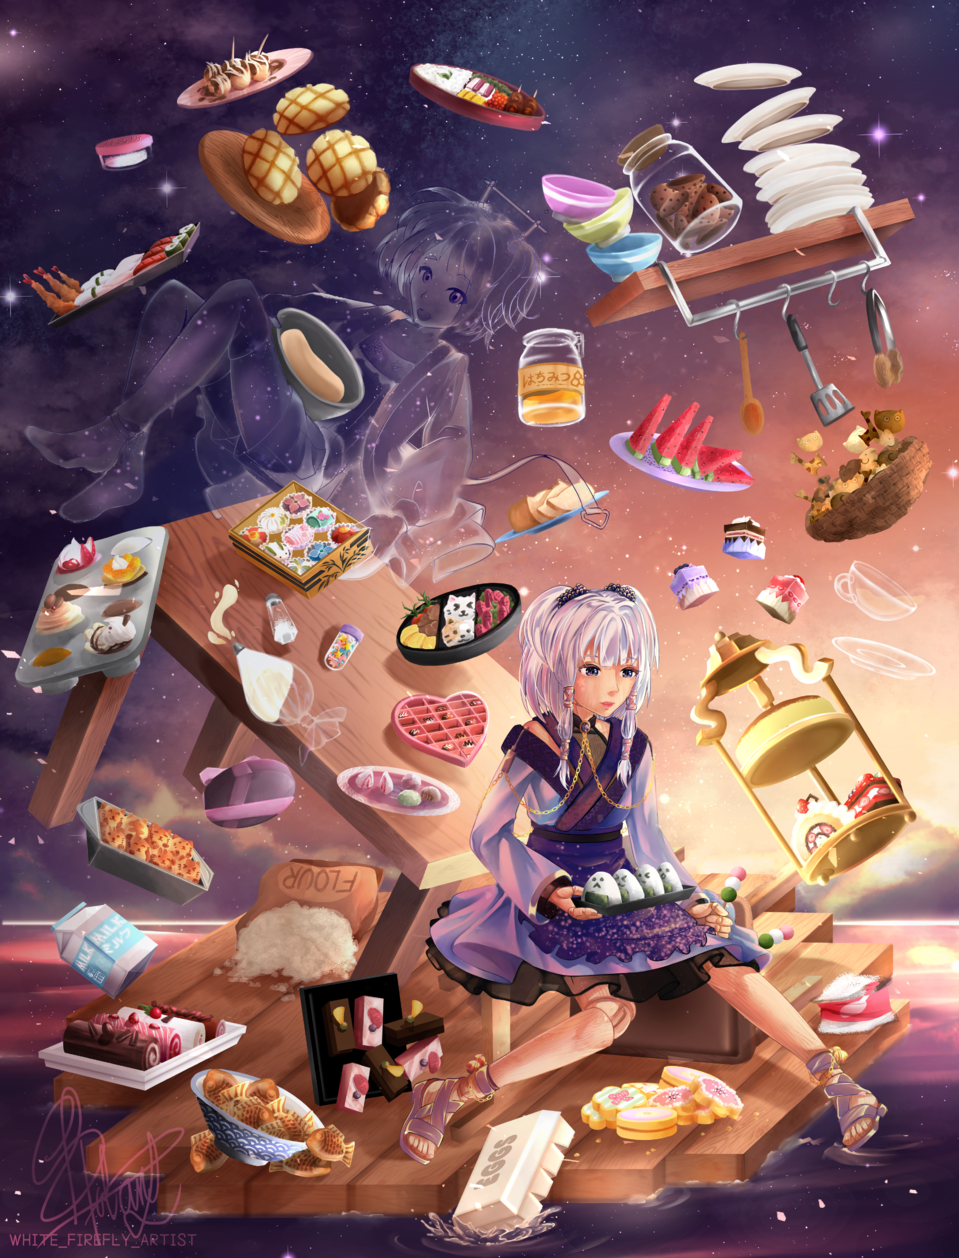 Shiki Illust of Shiro Hotaru October2020_Contest:Food mangagirl anime animegirl manga ishinokokoro mangaart